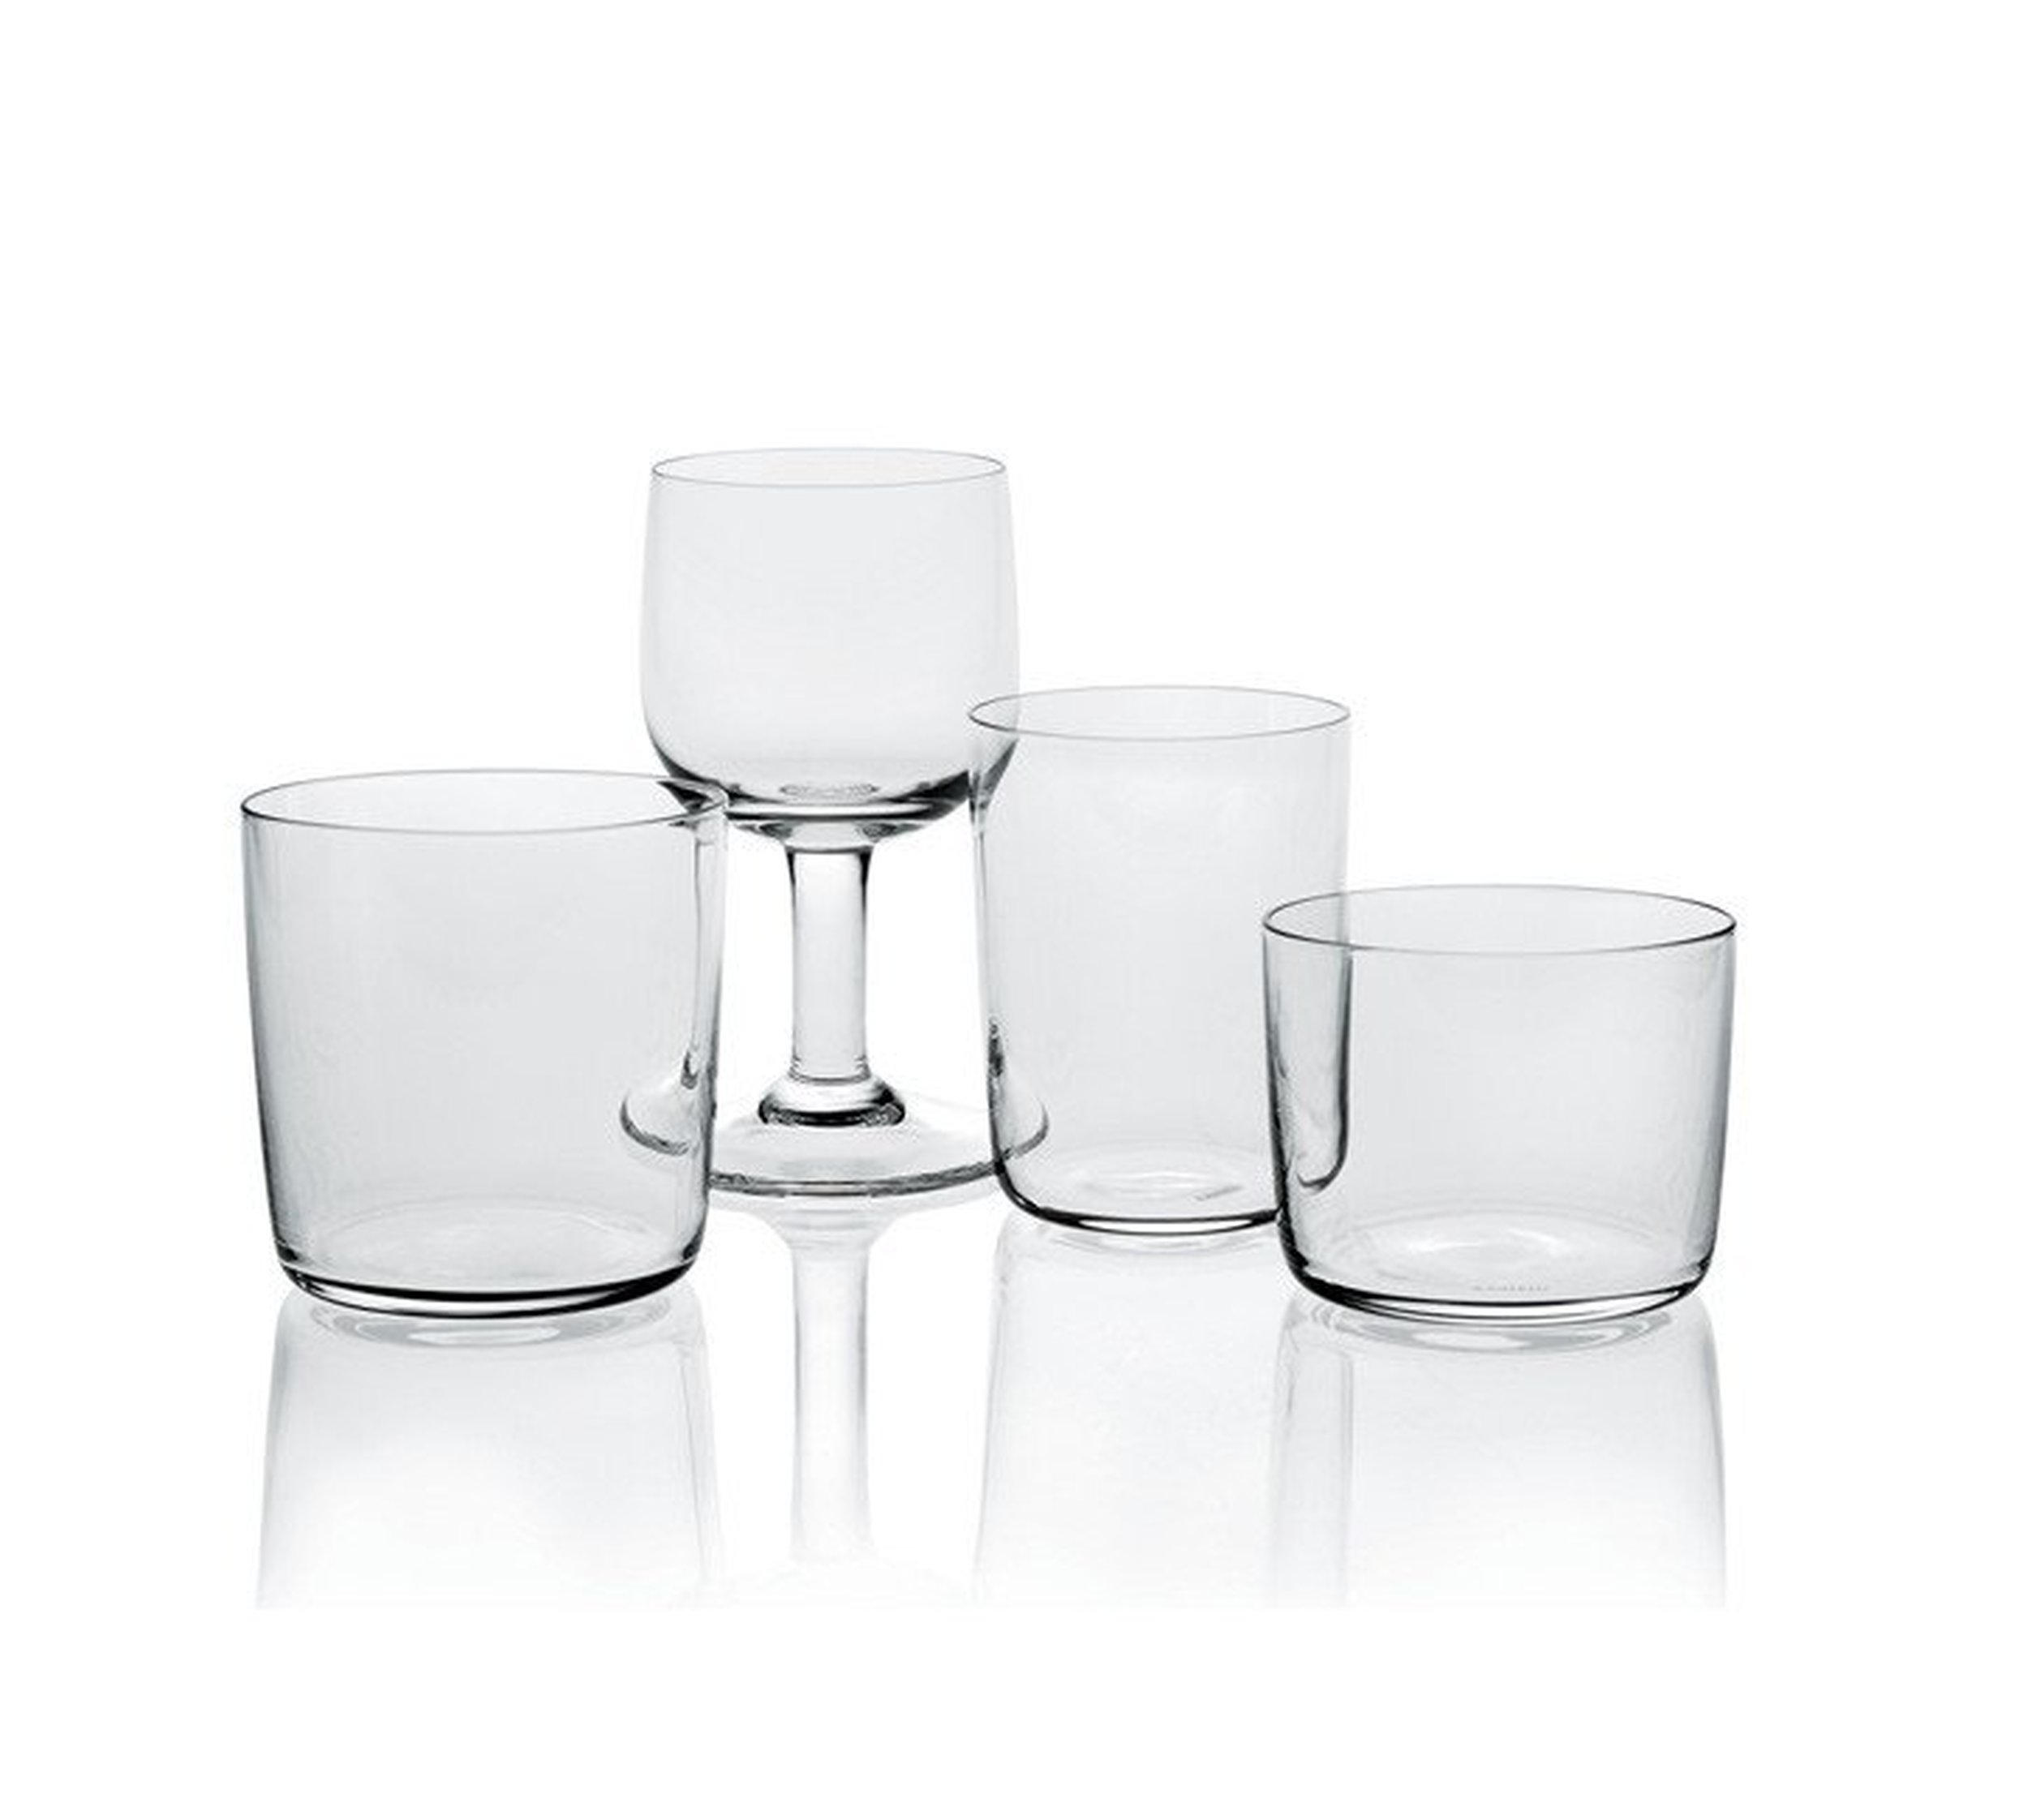 kieliszek glass family alessi ajm29 2 jasper morrison ff. Black Bedroom Furniture Sets. Home Design Ideas